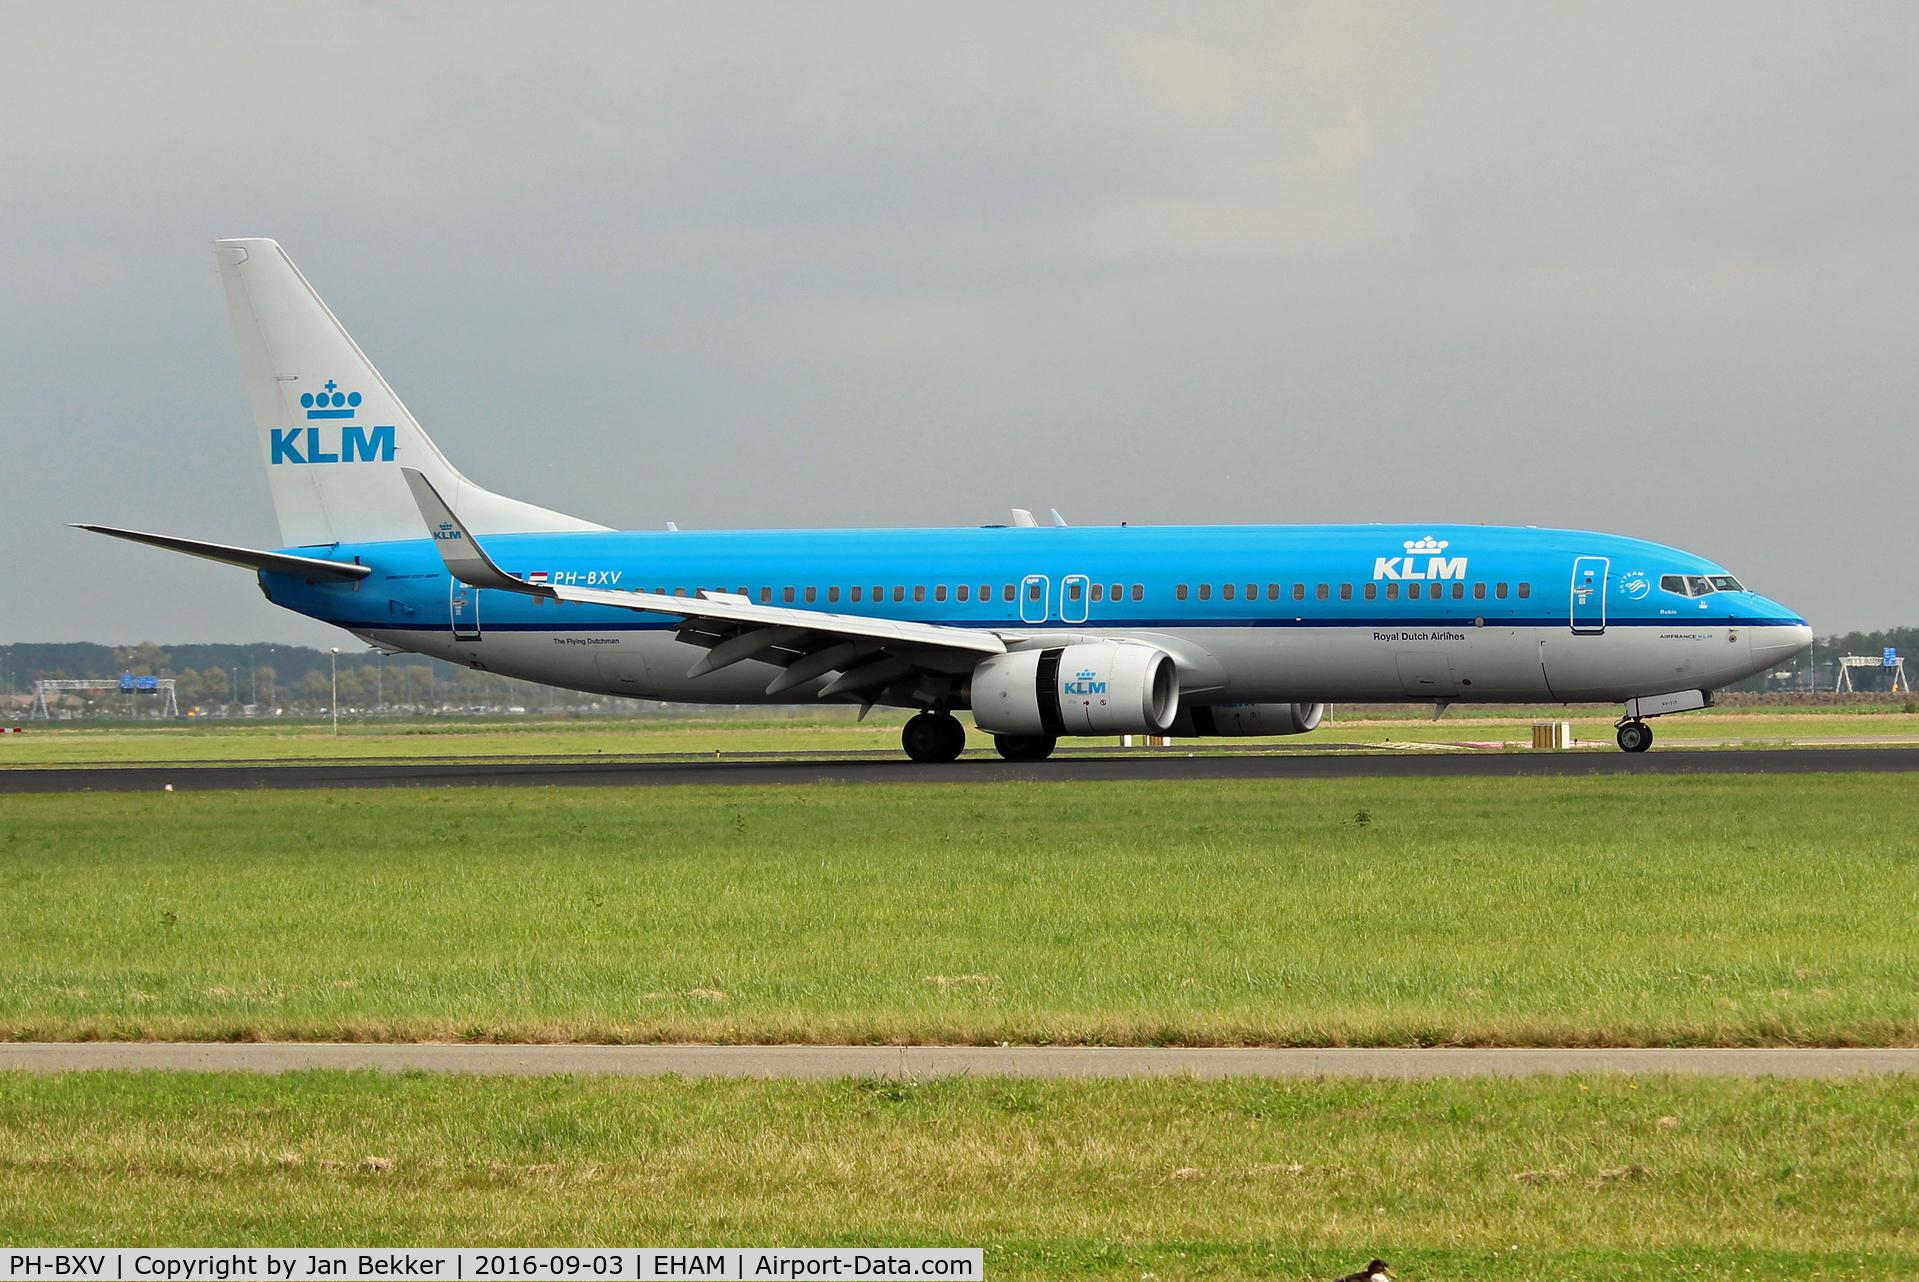 PH-BXV, 2007 Boeing 737-8K2 C/N 30370, Schiphol, Amsterdam